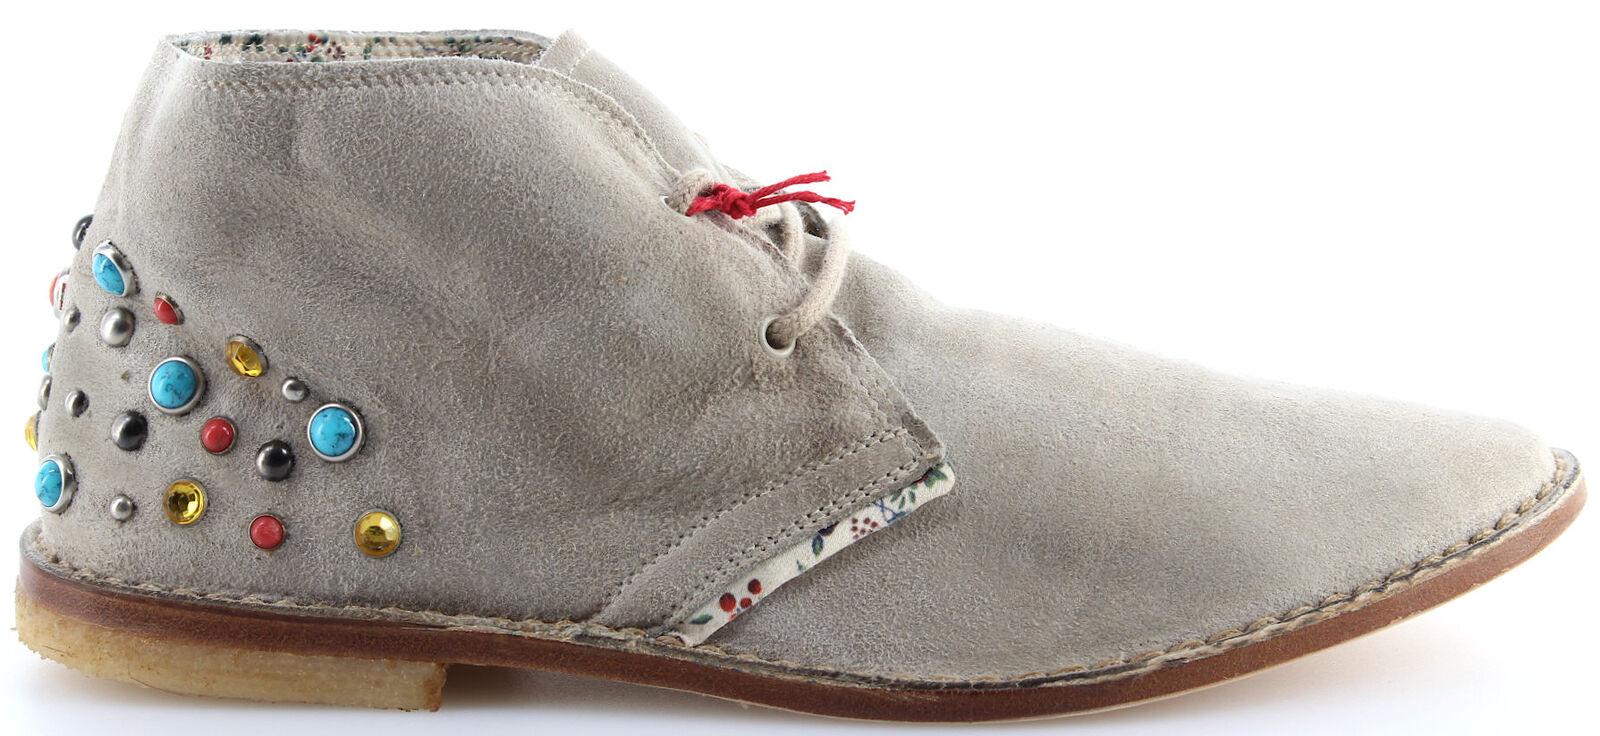 chaussures Mujer Botines Desert Boot YAB Clark Gamuza Gris Pernos Coloridos Made IT